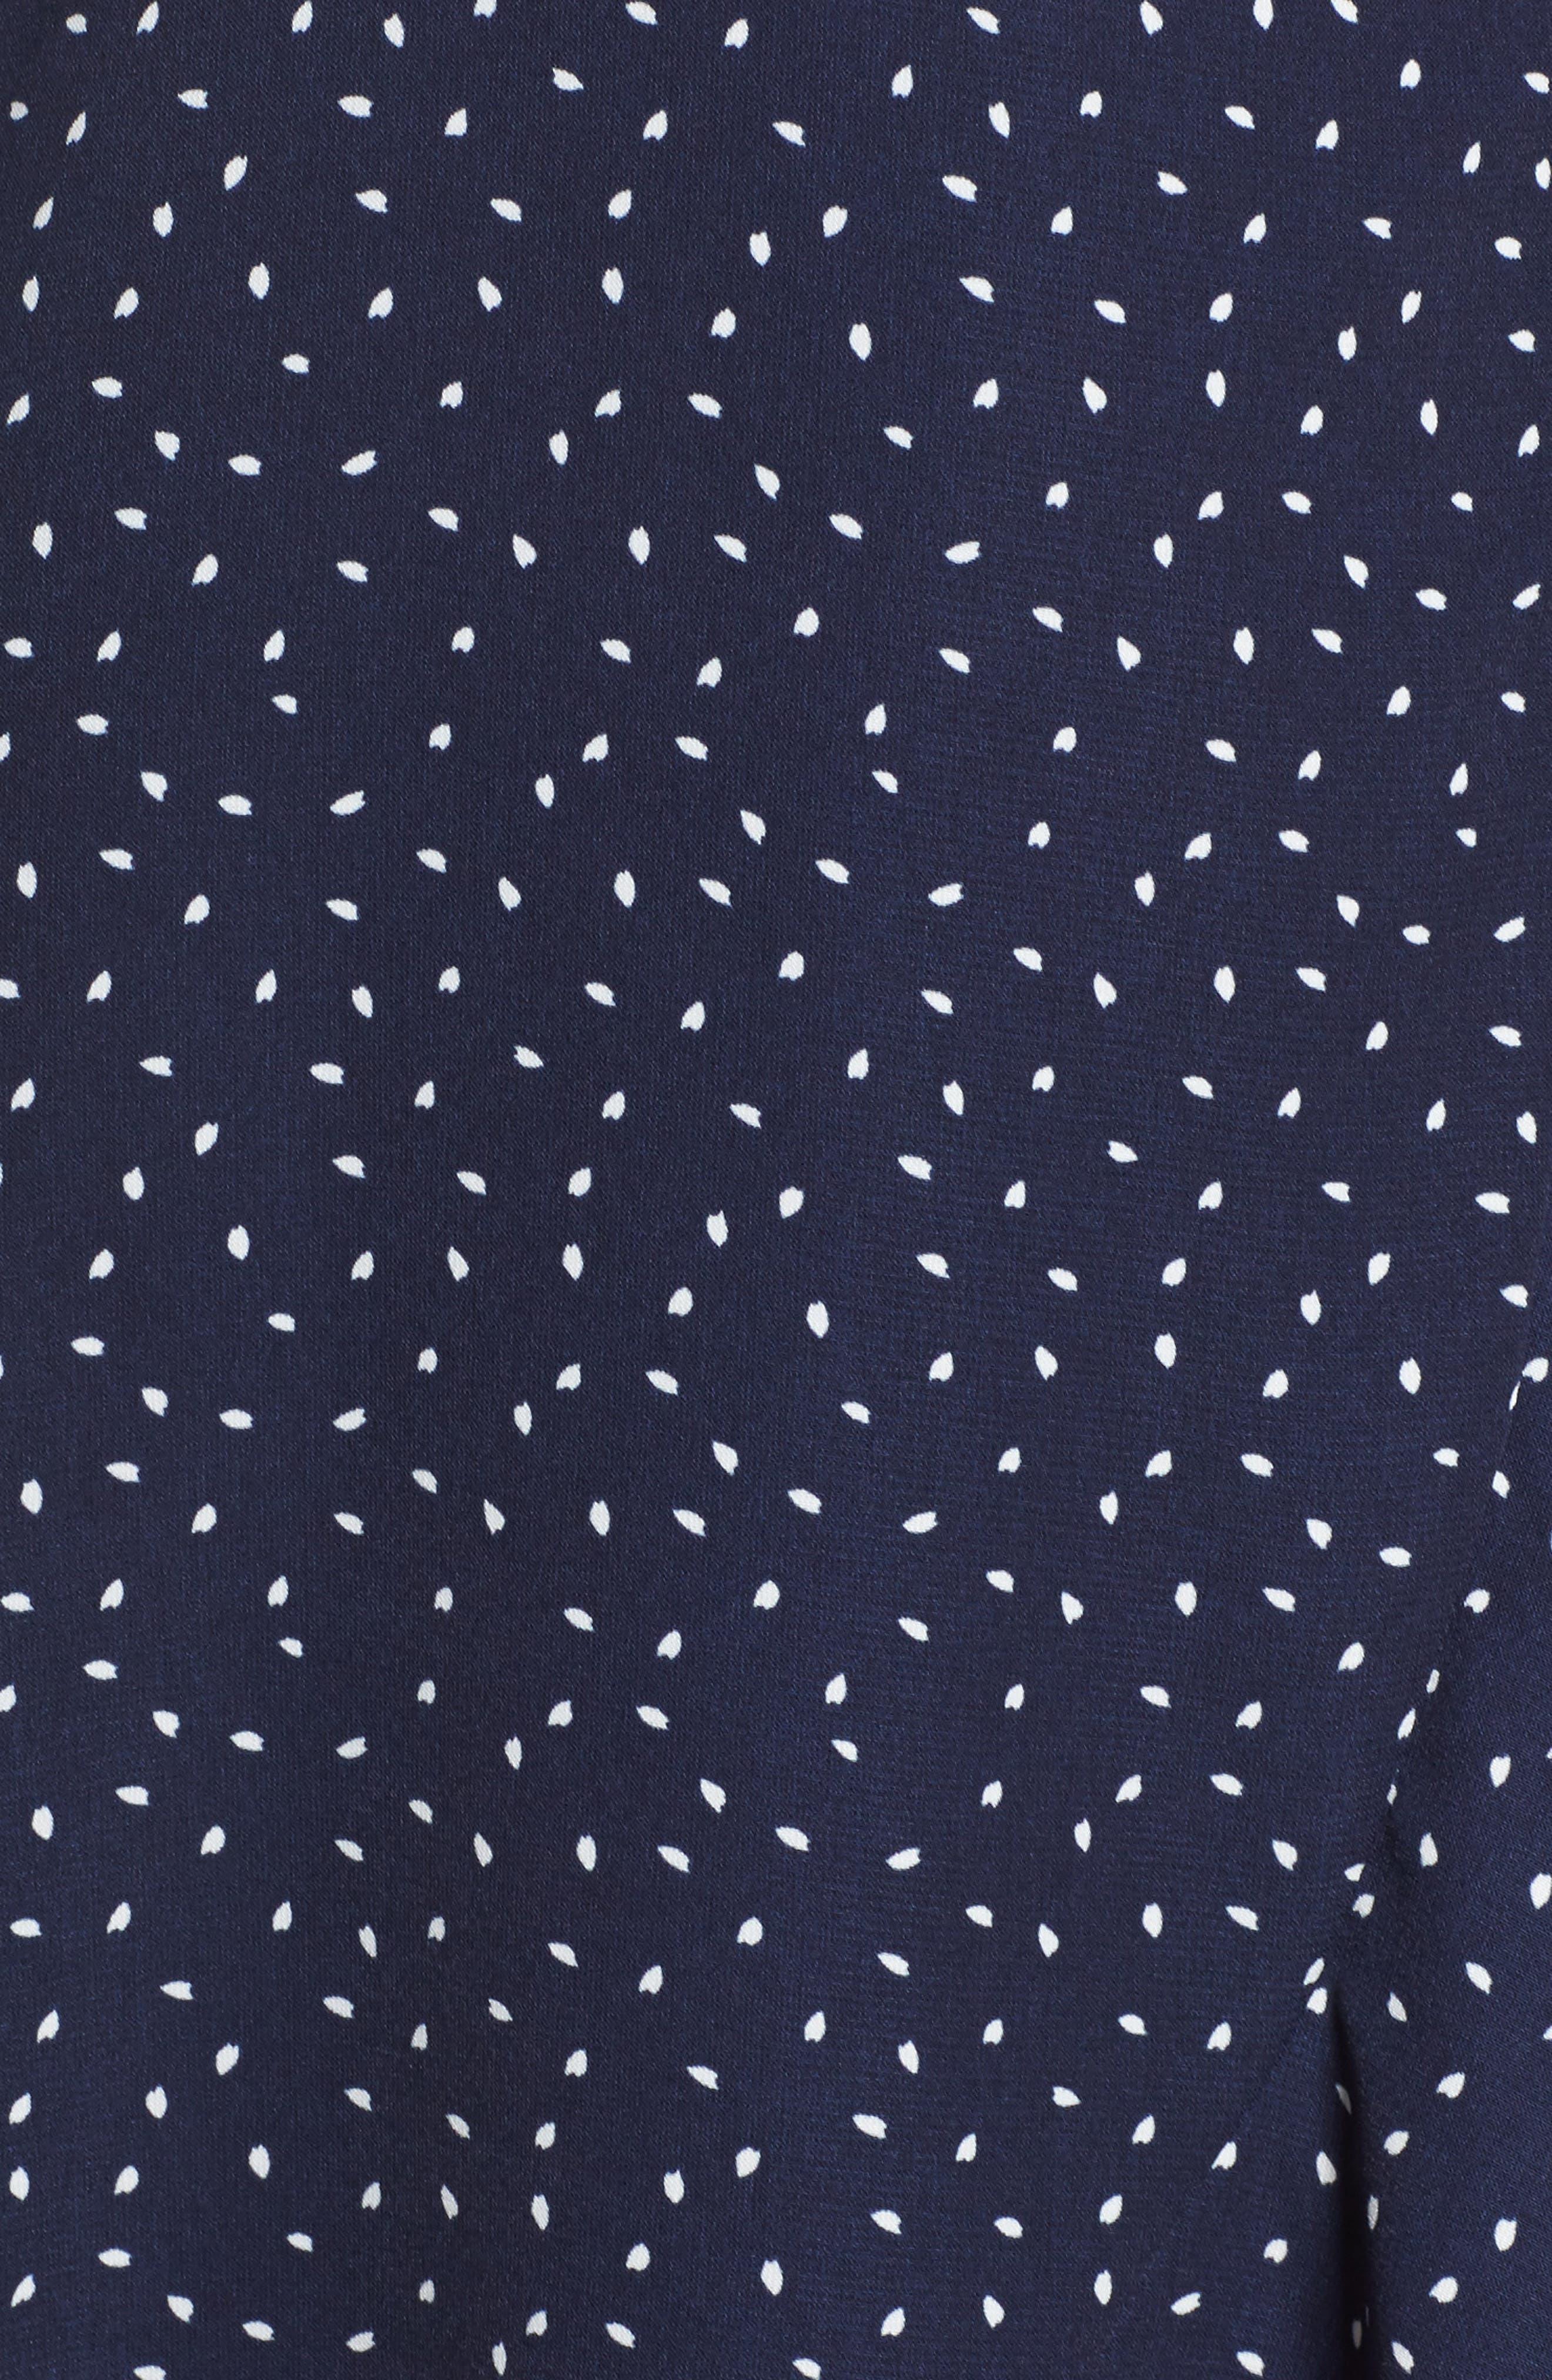 Print Wrap Dress,                             Alternate thumbnail 5, color,                             Small Mixed Dot